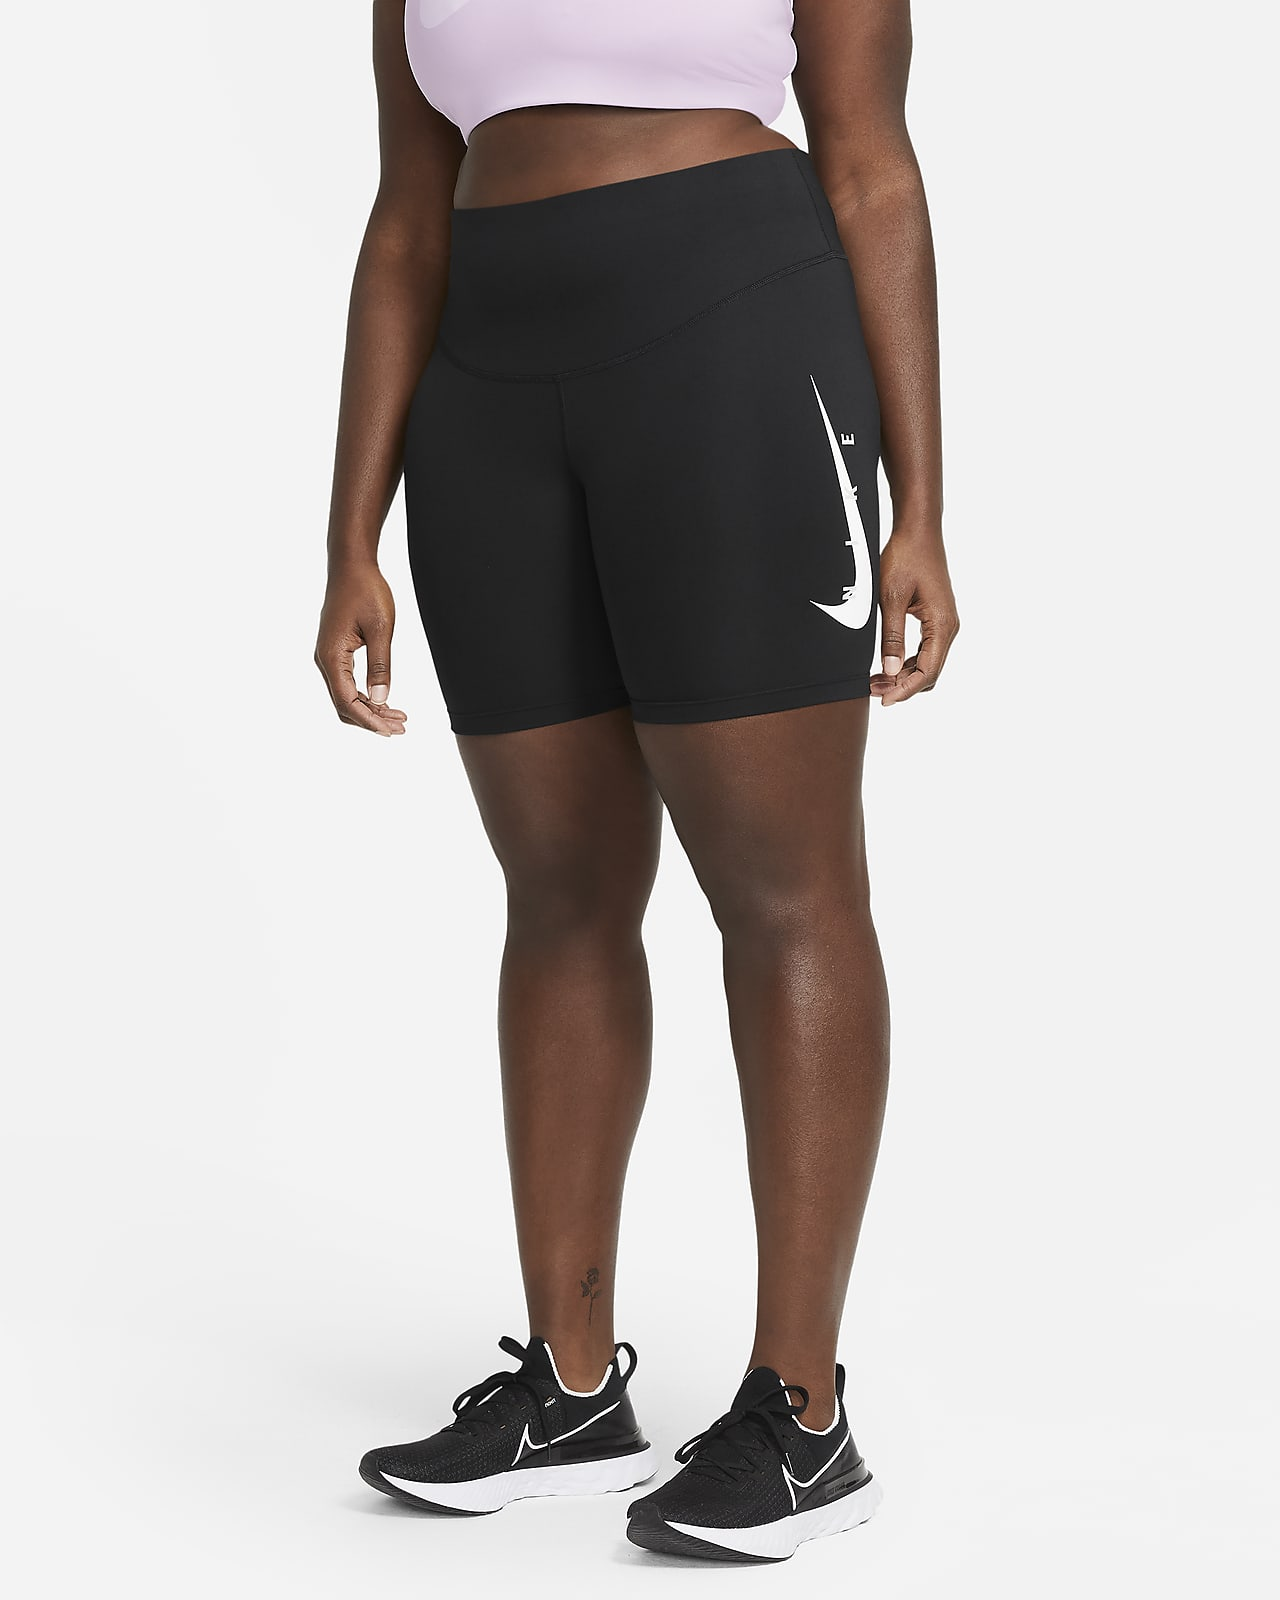 Legging de running Nike Swoosh Run 18 cm pour Femme (grande taille)